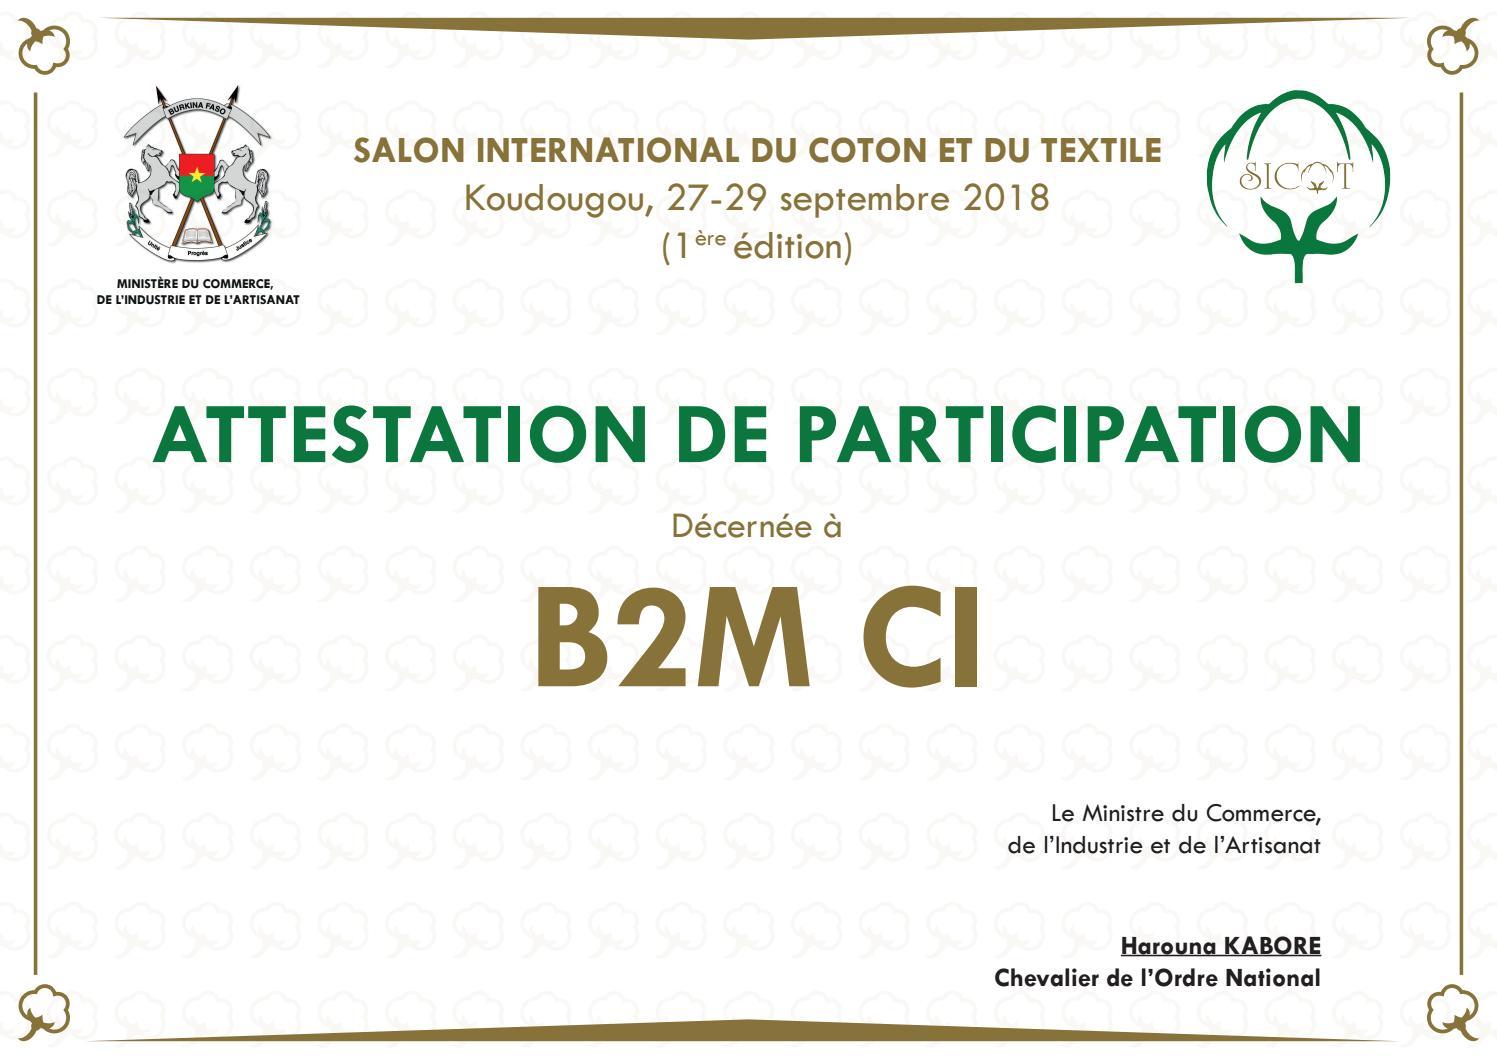 DA_ATTESTATION DE PARTICIPATION_SICOT 2018 by Delphicom ...